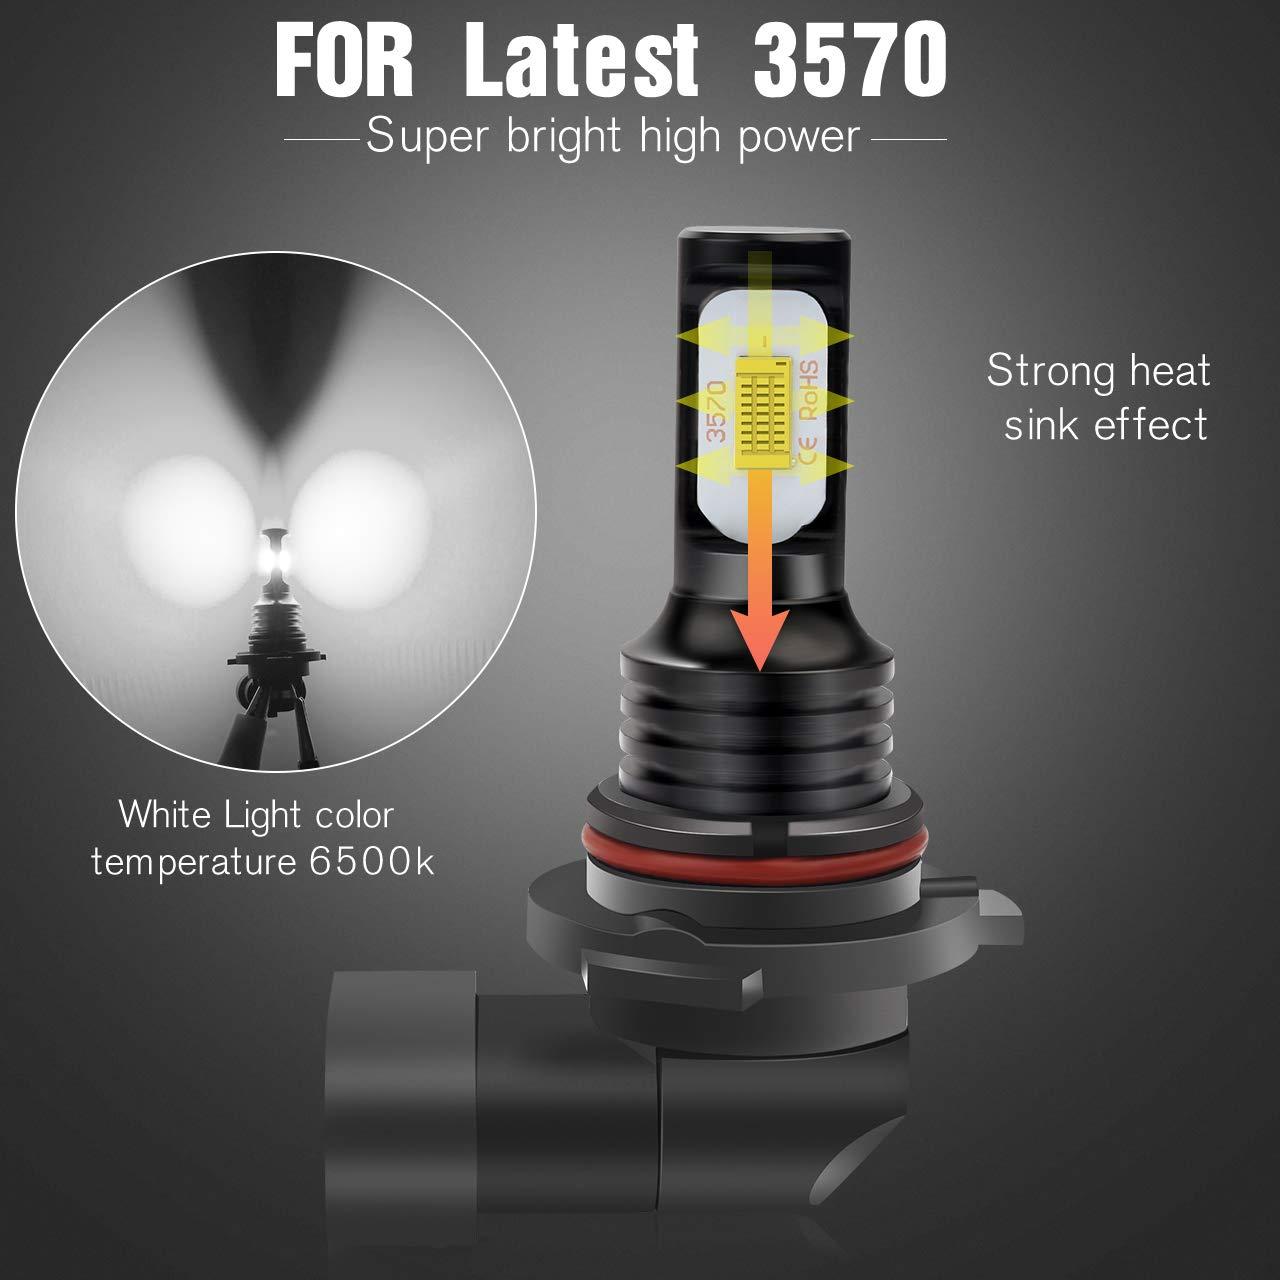 Amazon.com: KaTur 9006 HB4 LED Fog Light Bulbs Extremely Bright 2400 Lumens Max 75W High Power LED for Daytime Running Light DRL or Fog Lights, ...